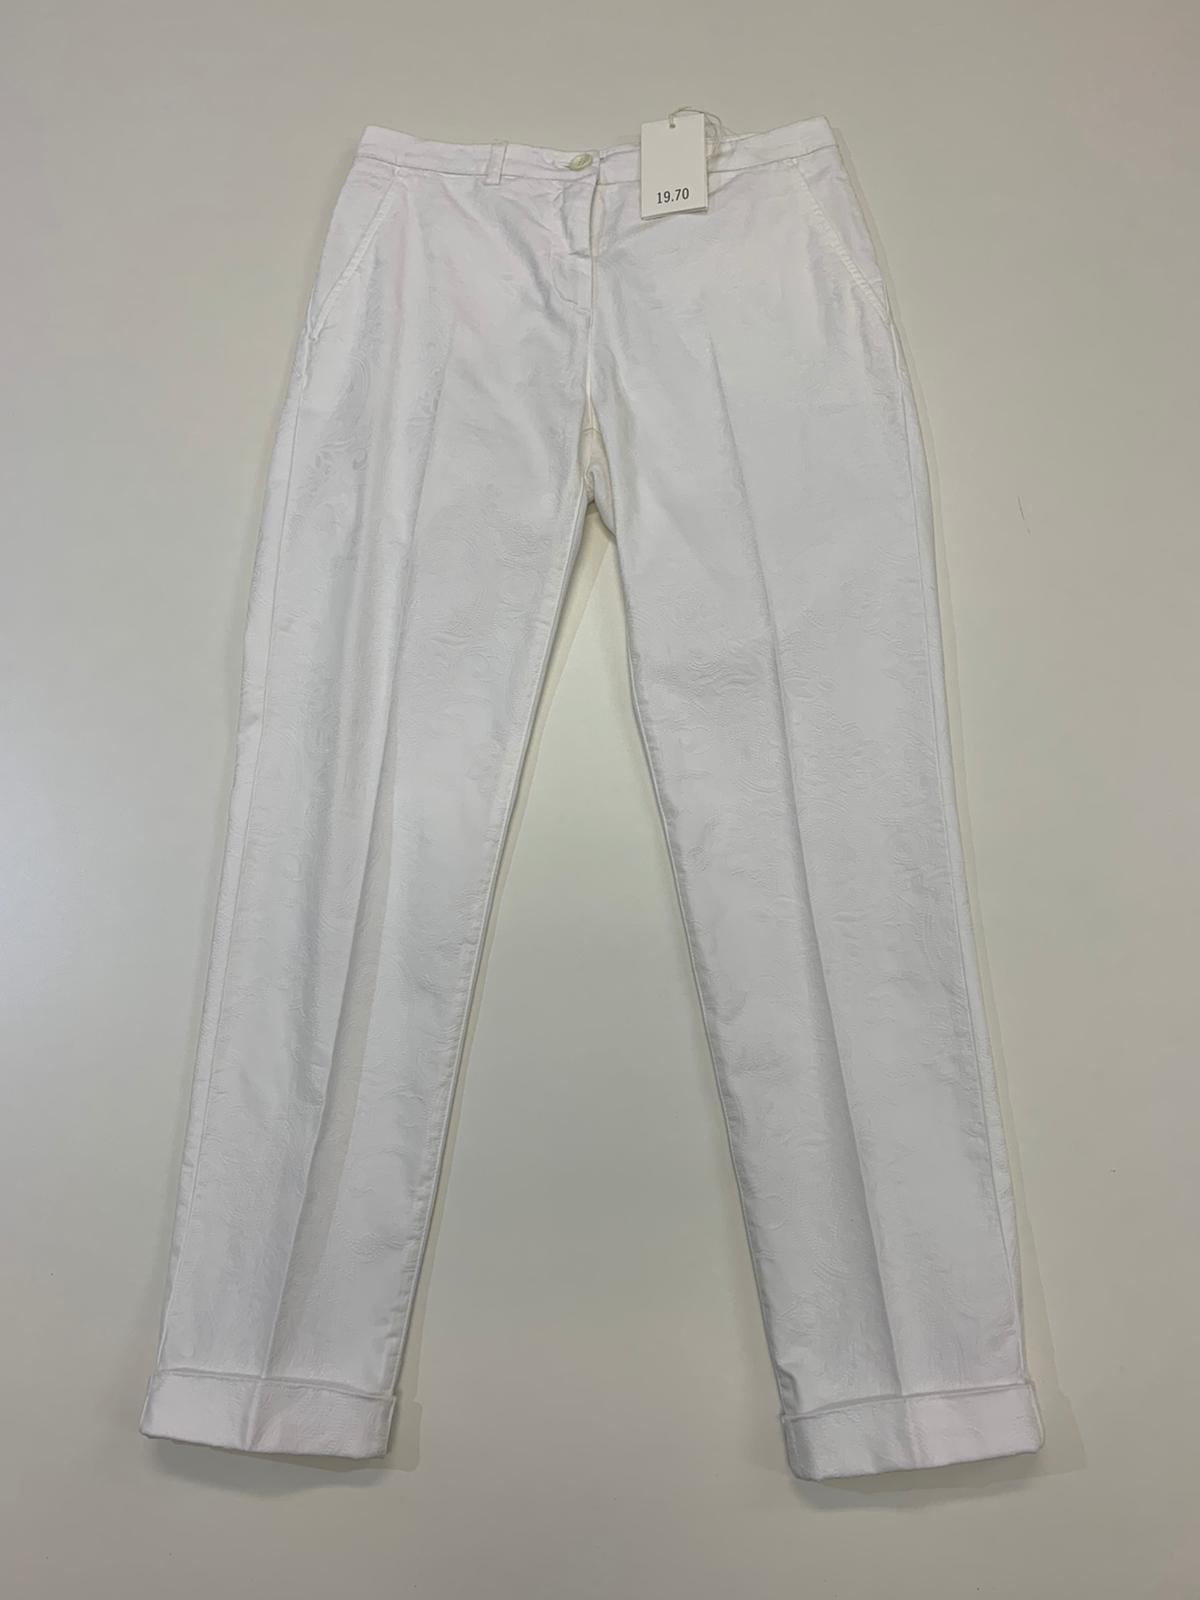 Pantalone Donna Seventy Bianco